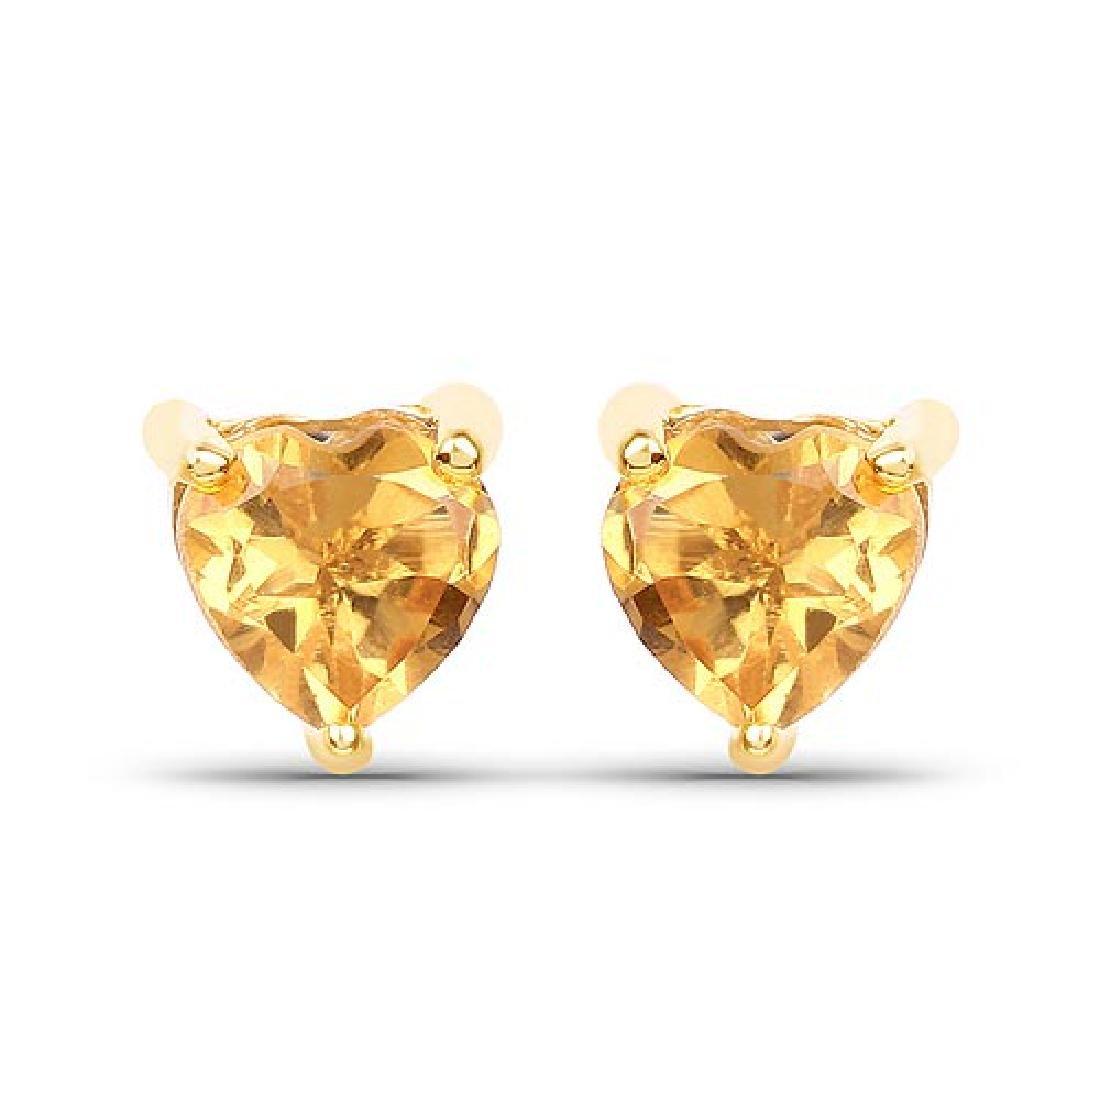 0.50 Carat Genuine Citrine 10K Yellow Gold Earrings